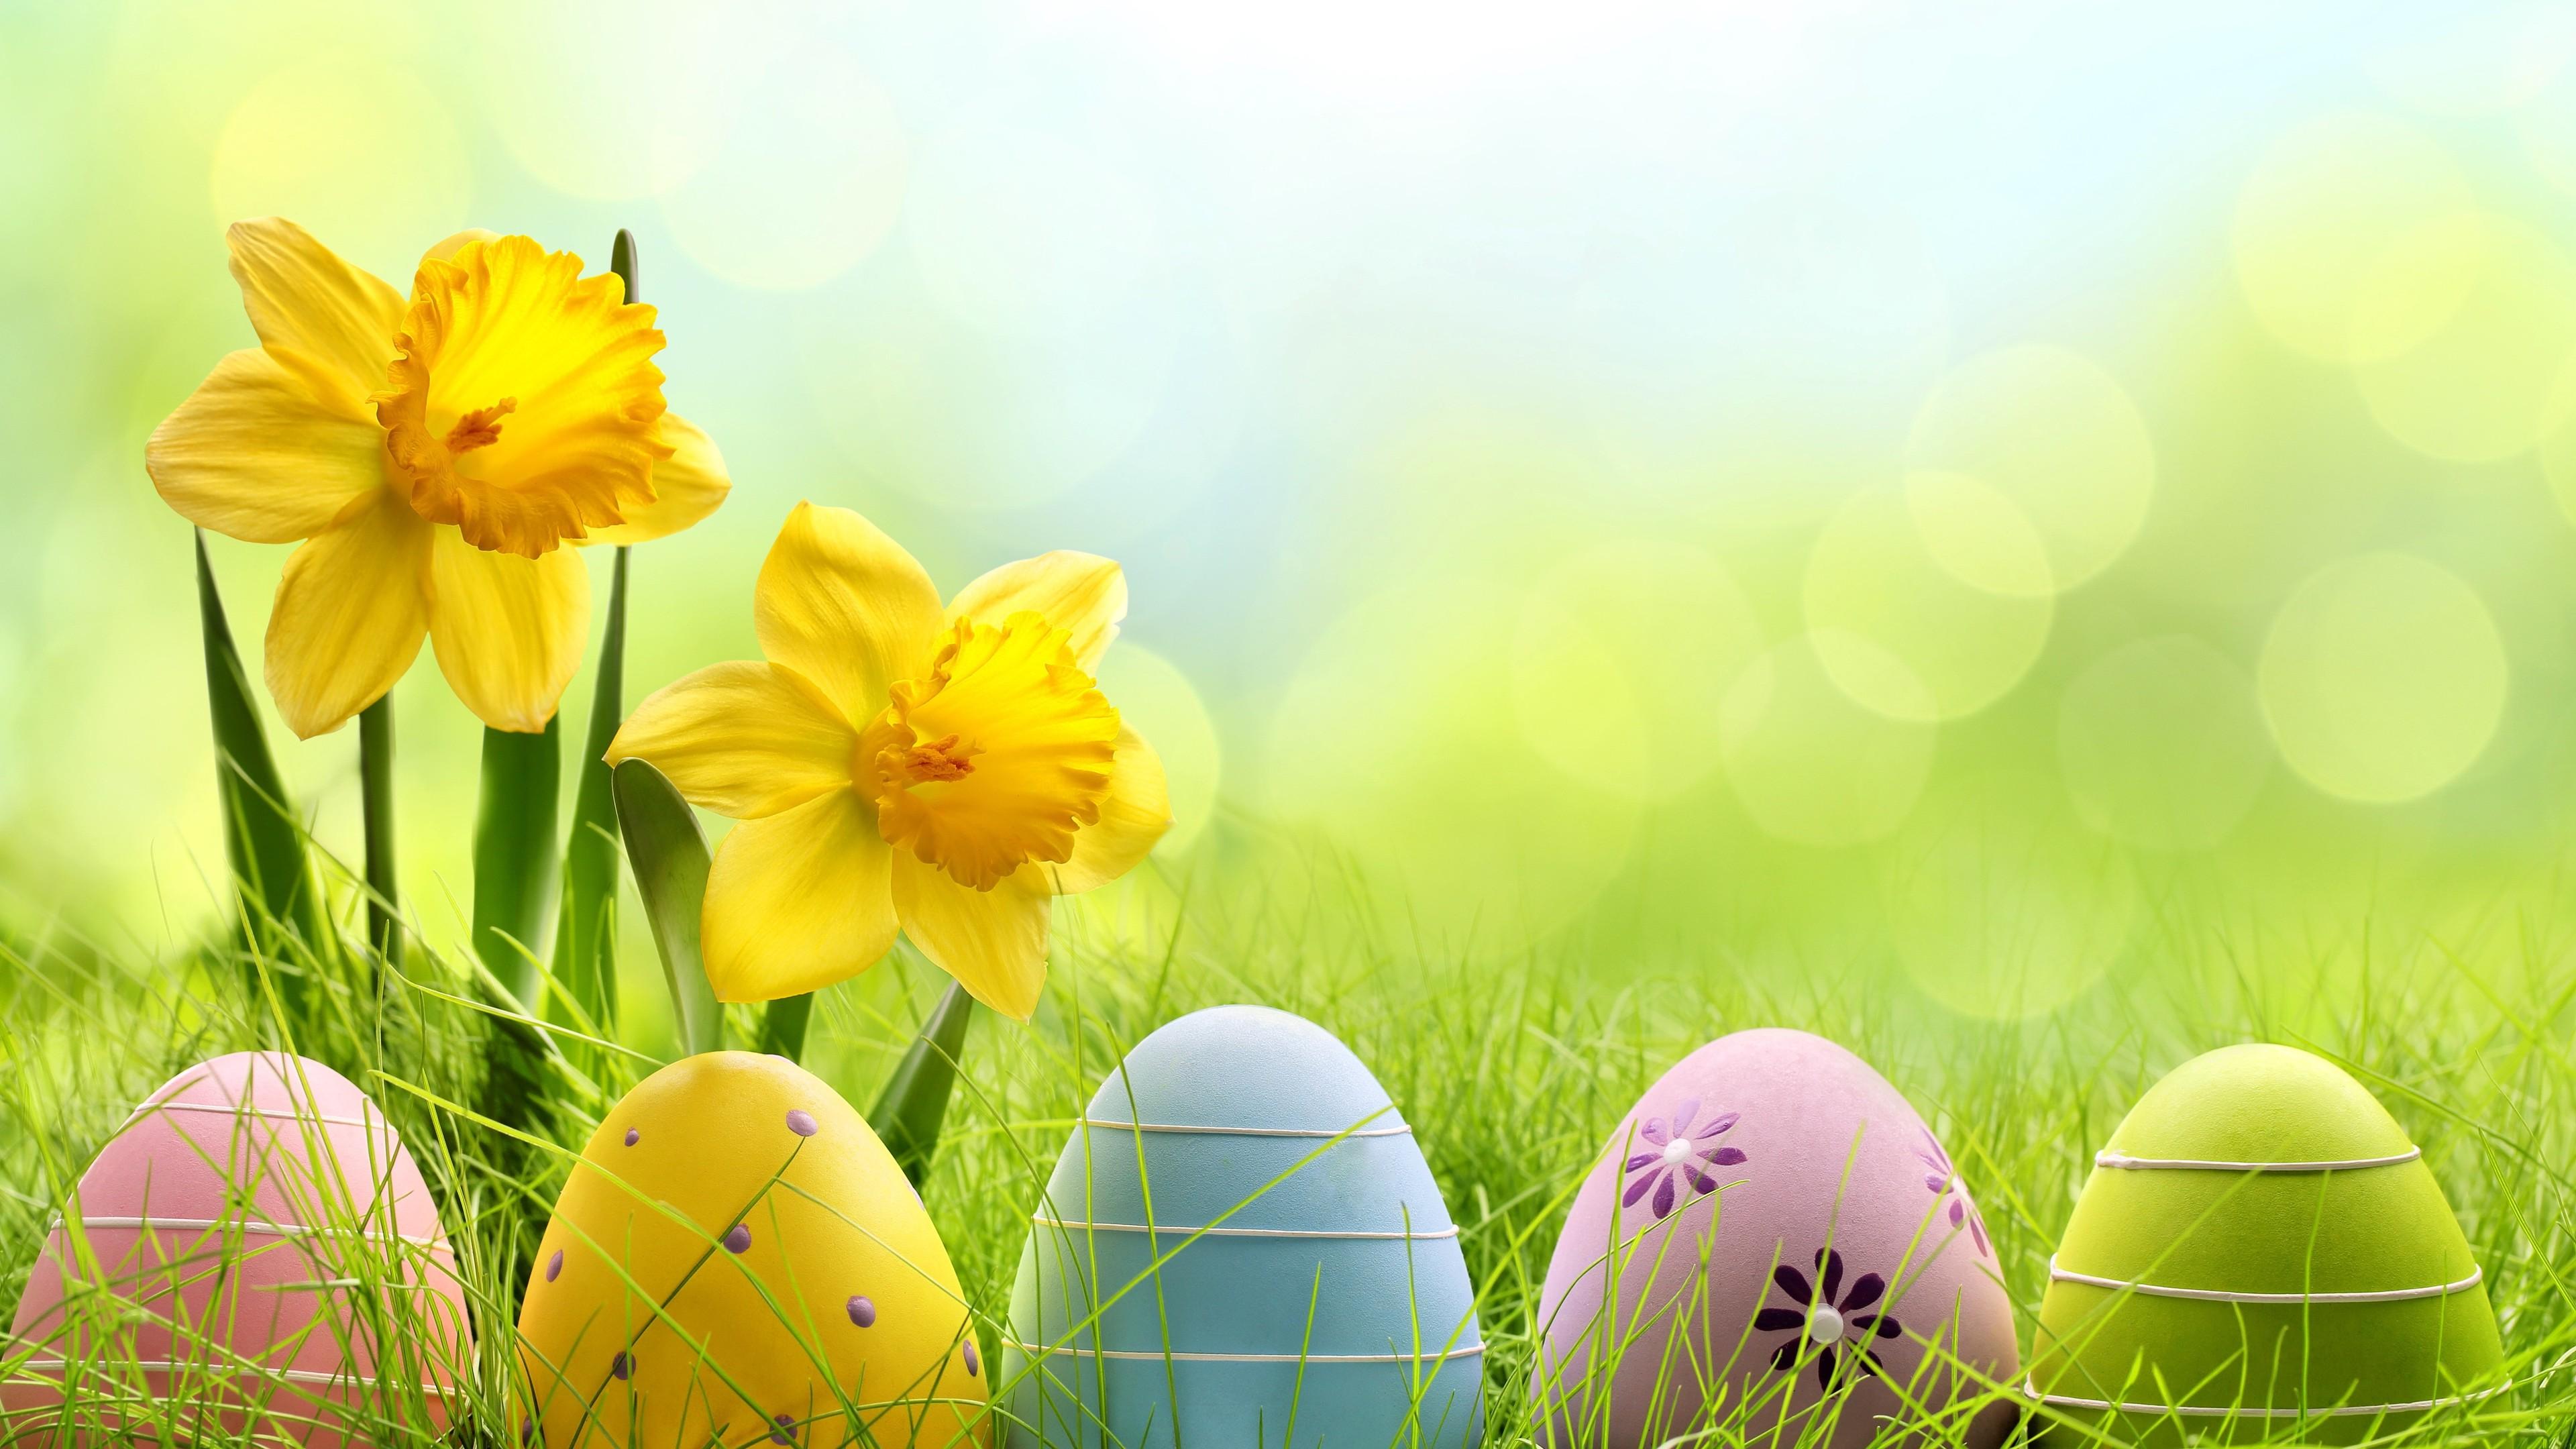 holiday easter egg 4k 1543946387 - Holiday Easter Egg 4k - eggs wallpapers, easter wallpapers, celebrations wallpapers